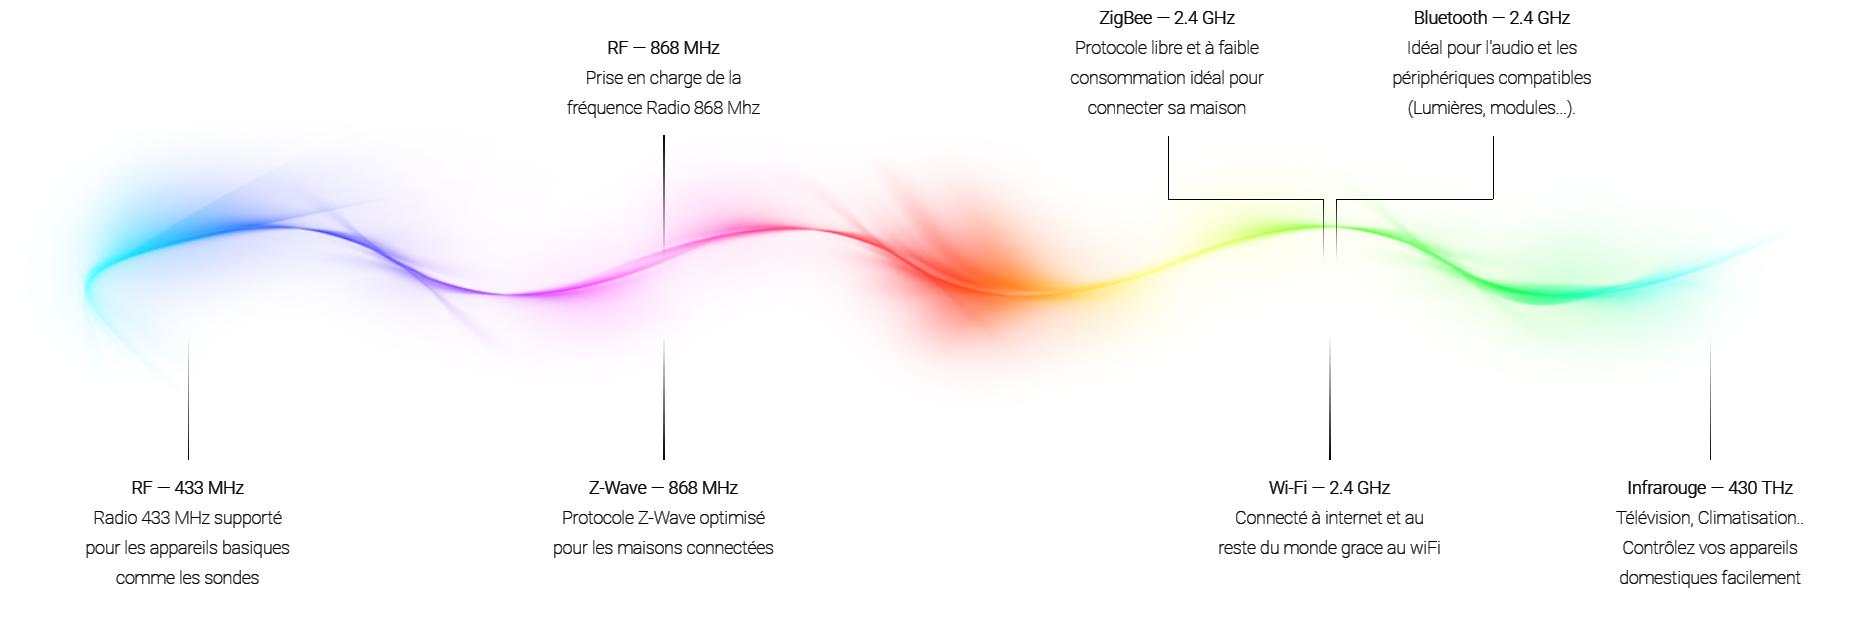 Homey, Box domotique Z-Wave, Zigbee, WiFi, Infrarouge